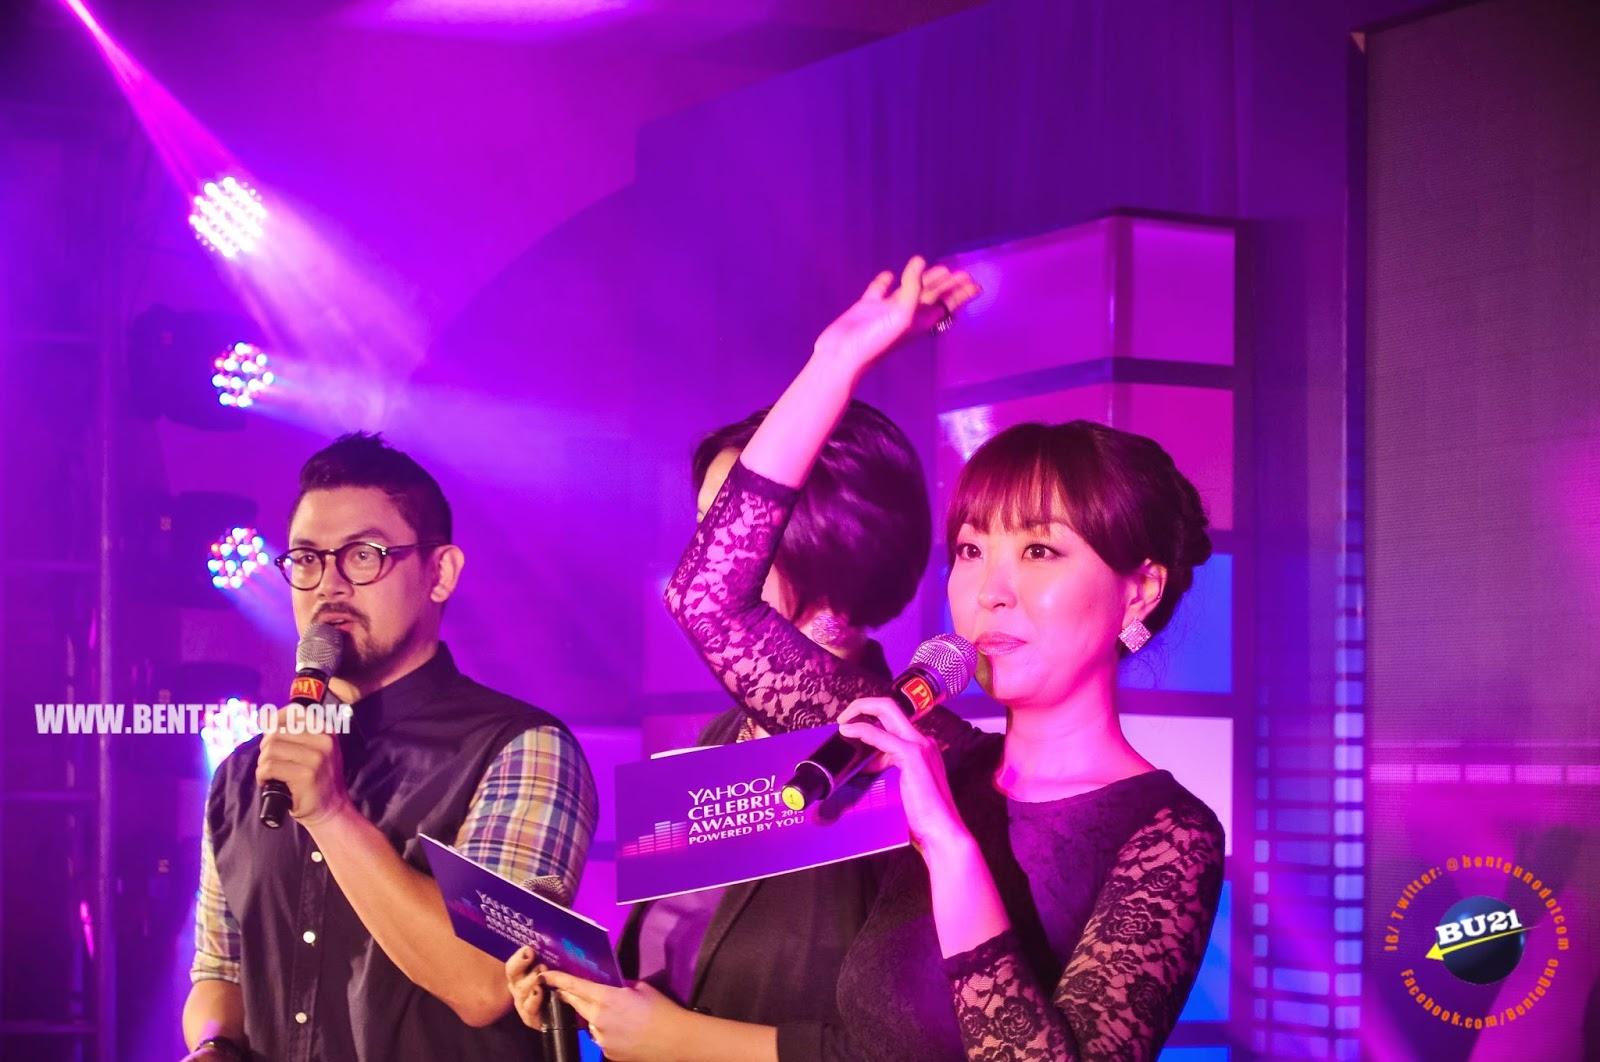 Sam Oh hosts Yahoo Celebrity Awards 2014 media launch